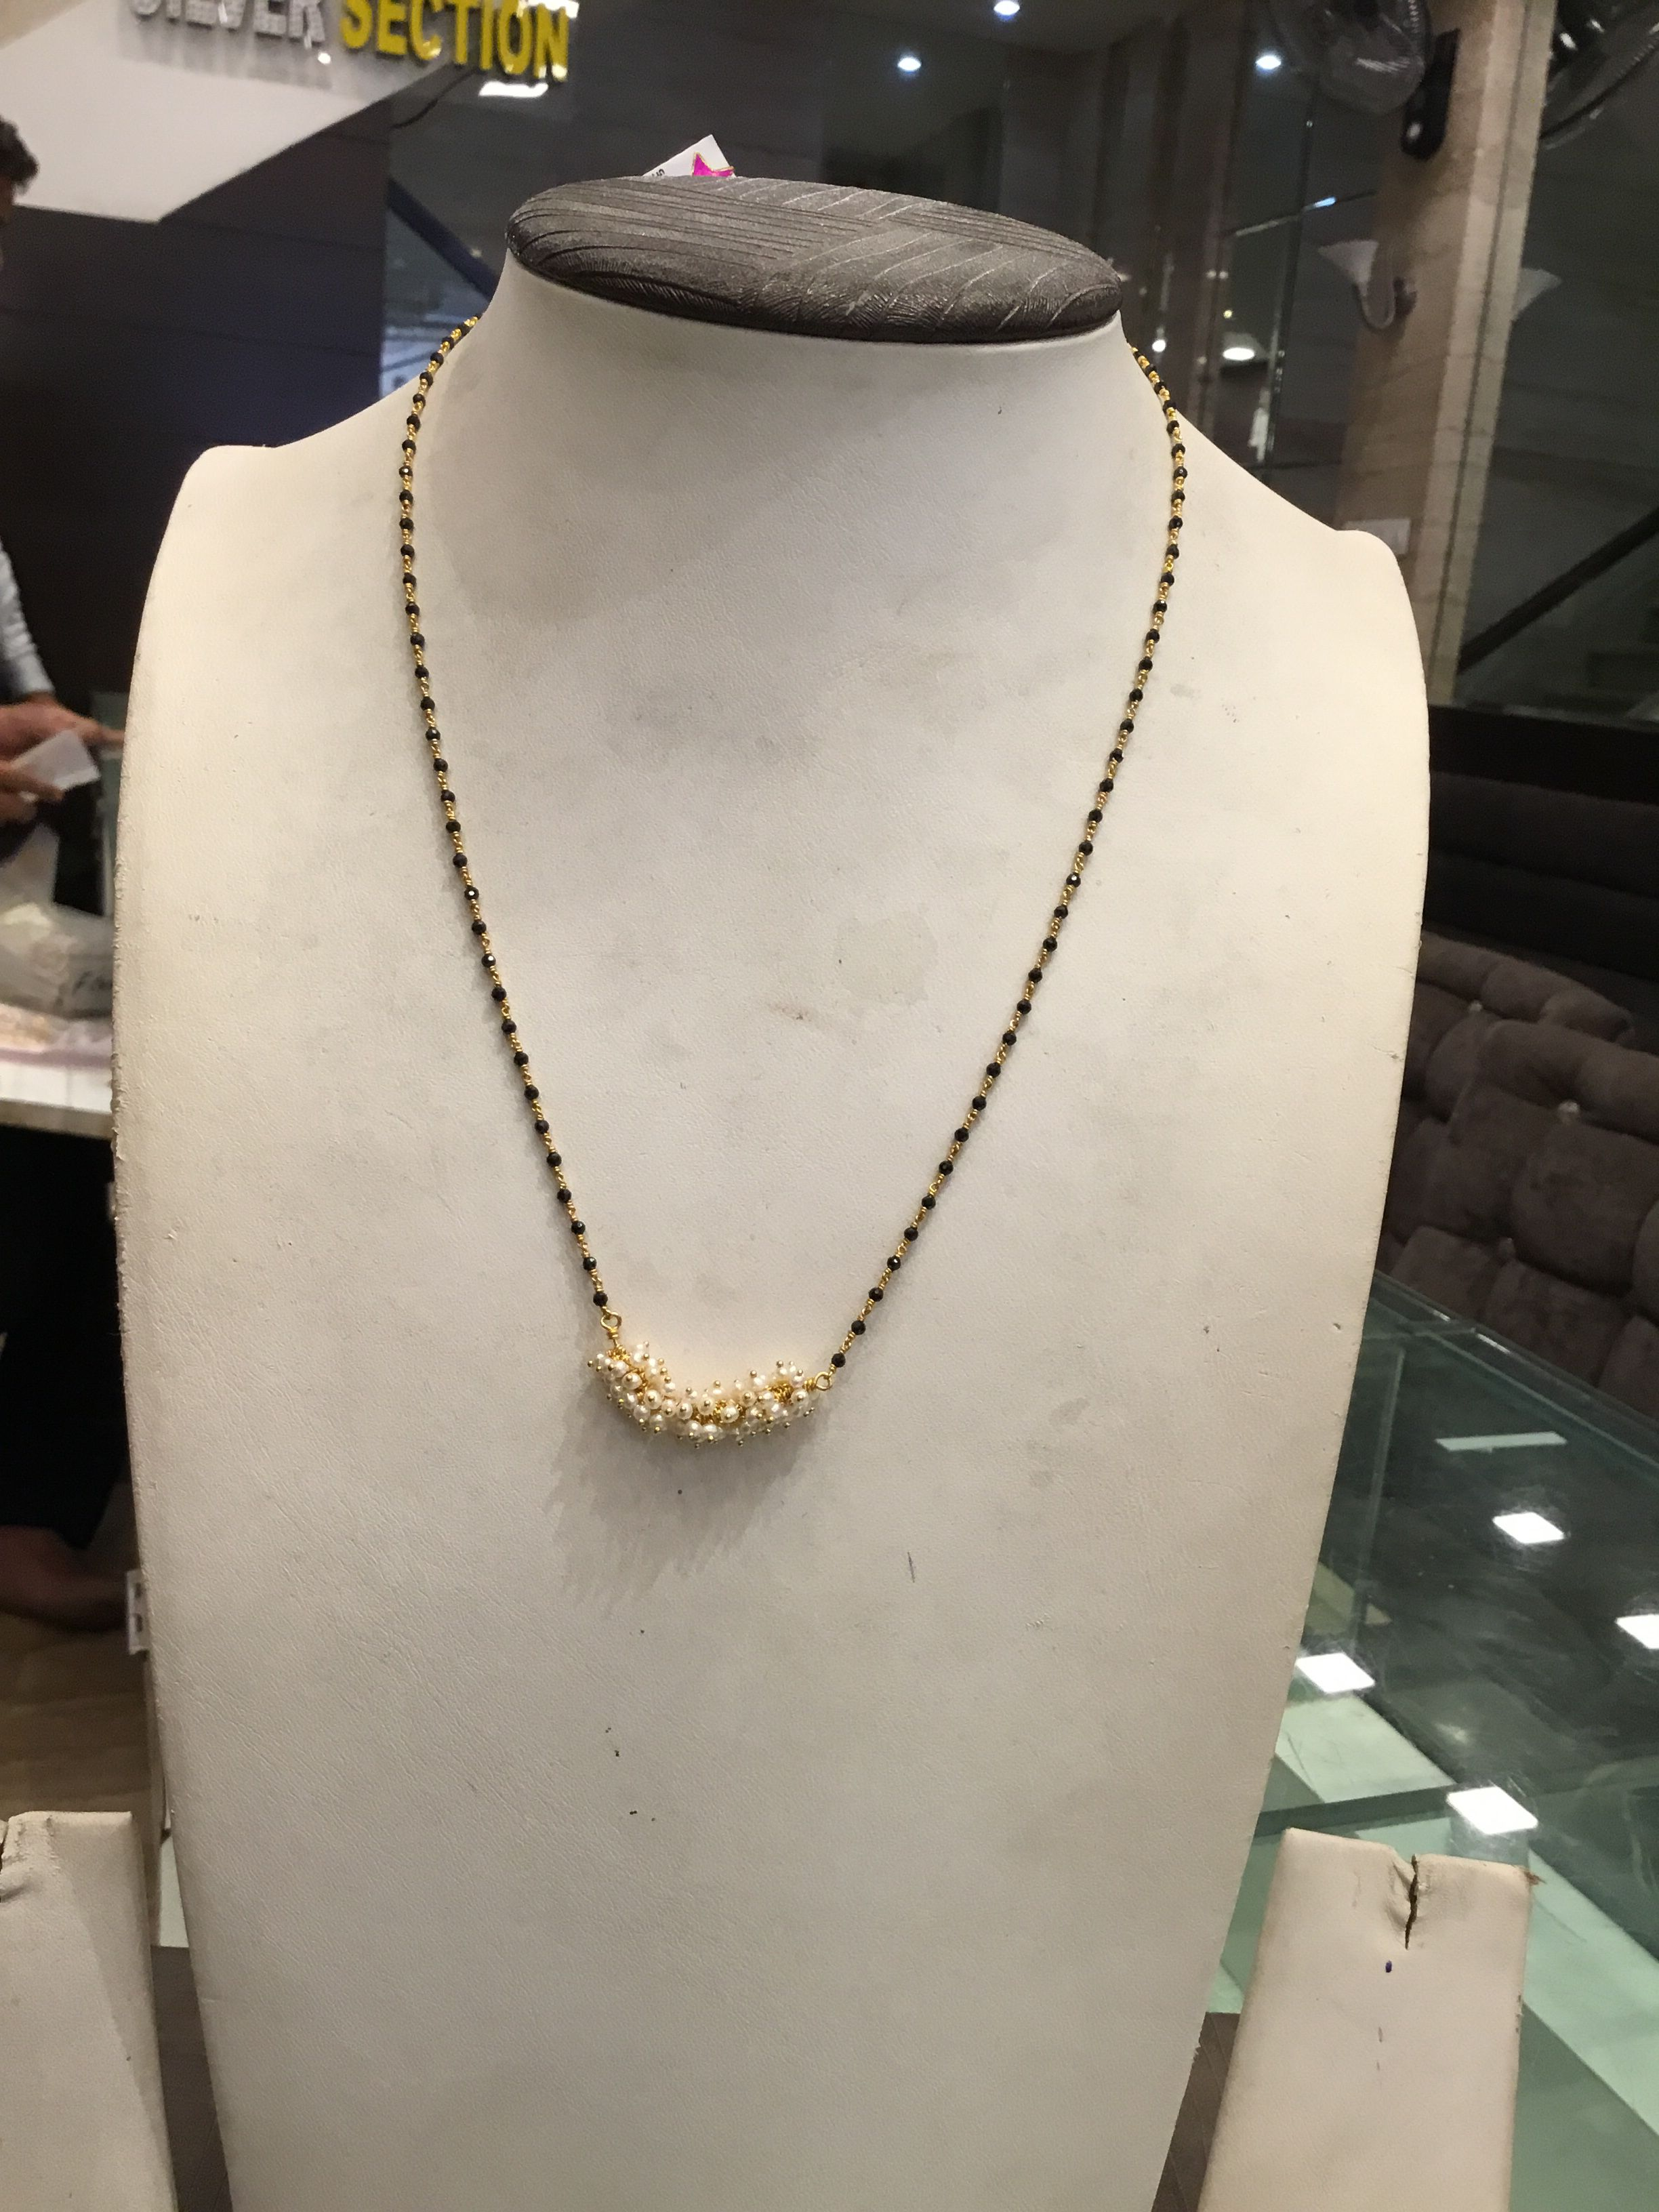 Pin by Farzana Mustafa on Dream jewelry  in 2019 | Gold mangalsutra